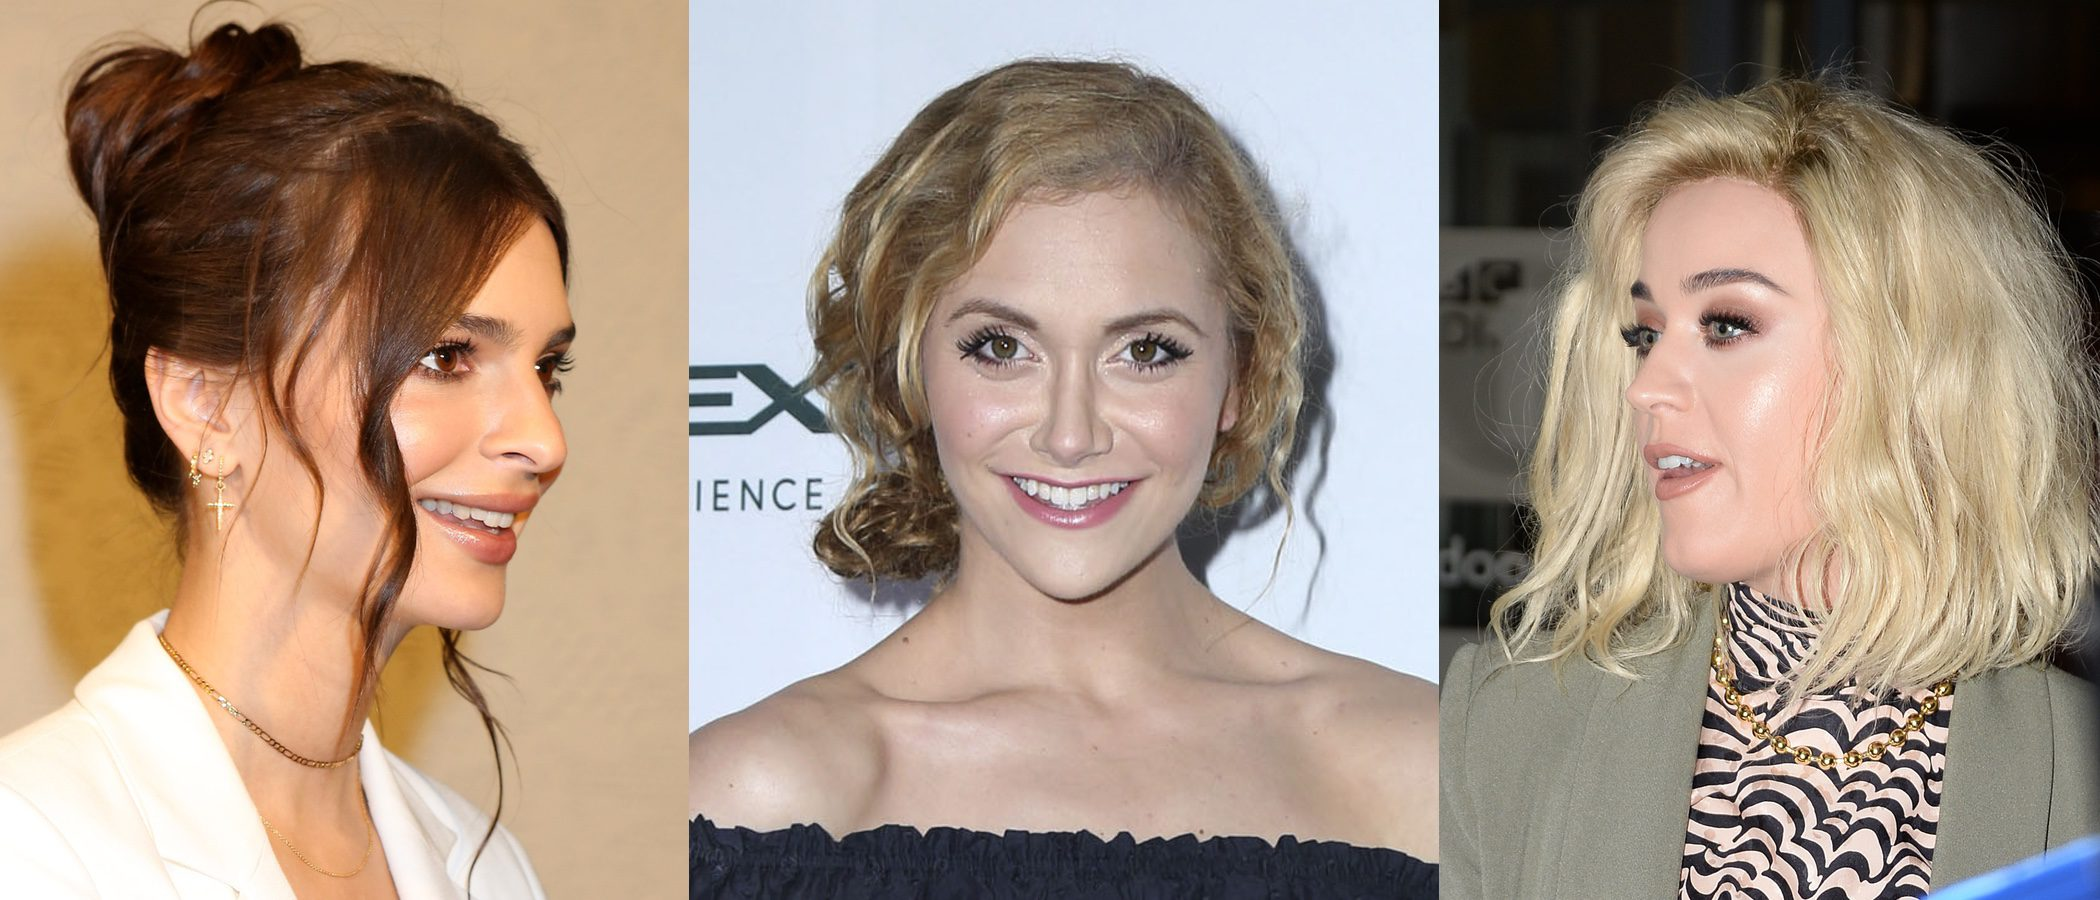 Emily Ratajkowski, Alyson Stoner y Katy Perry entre los peores beauty looks de la semana